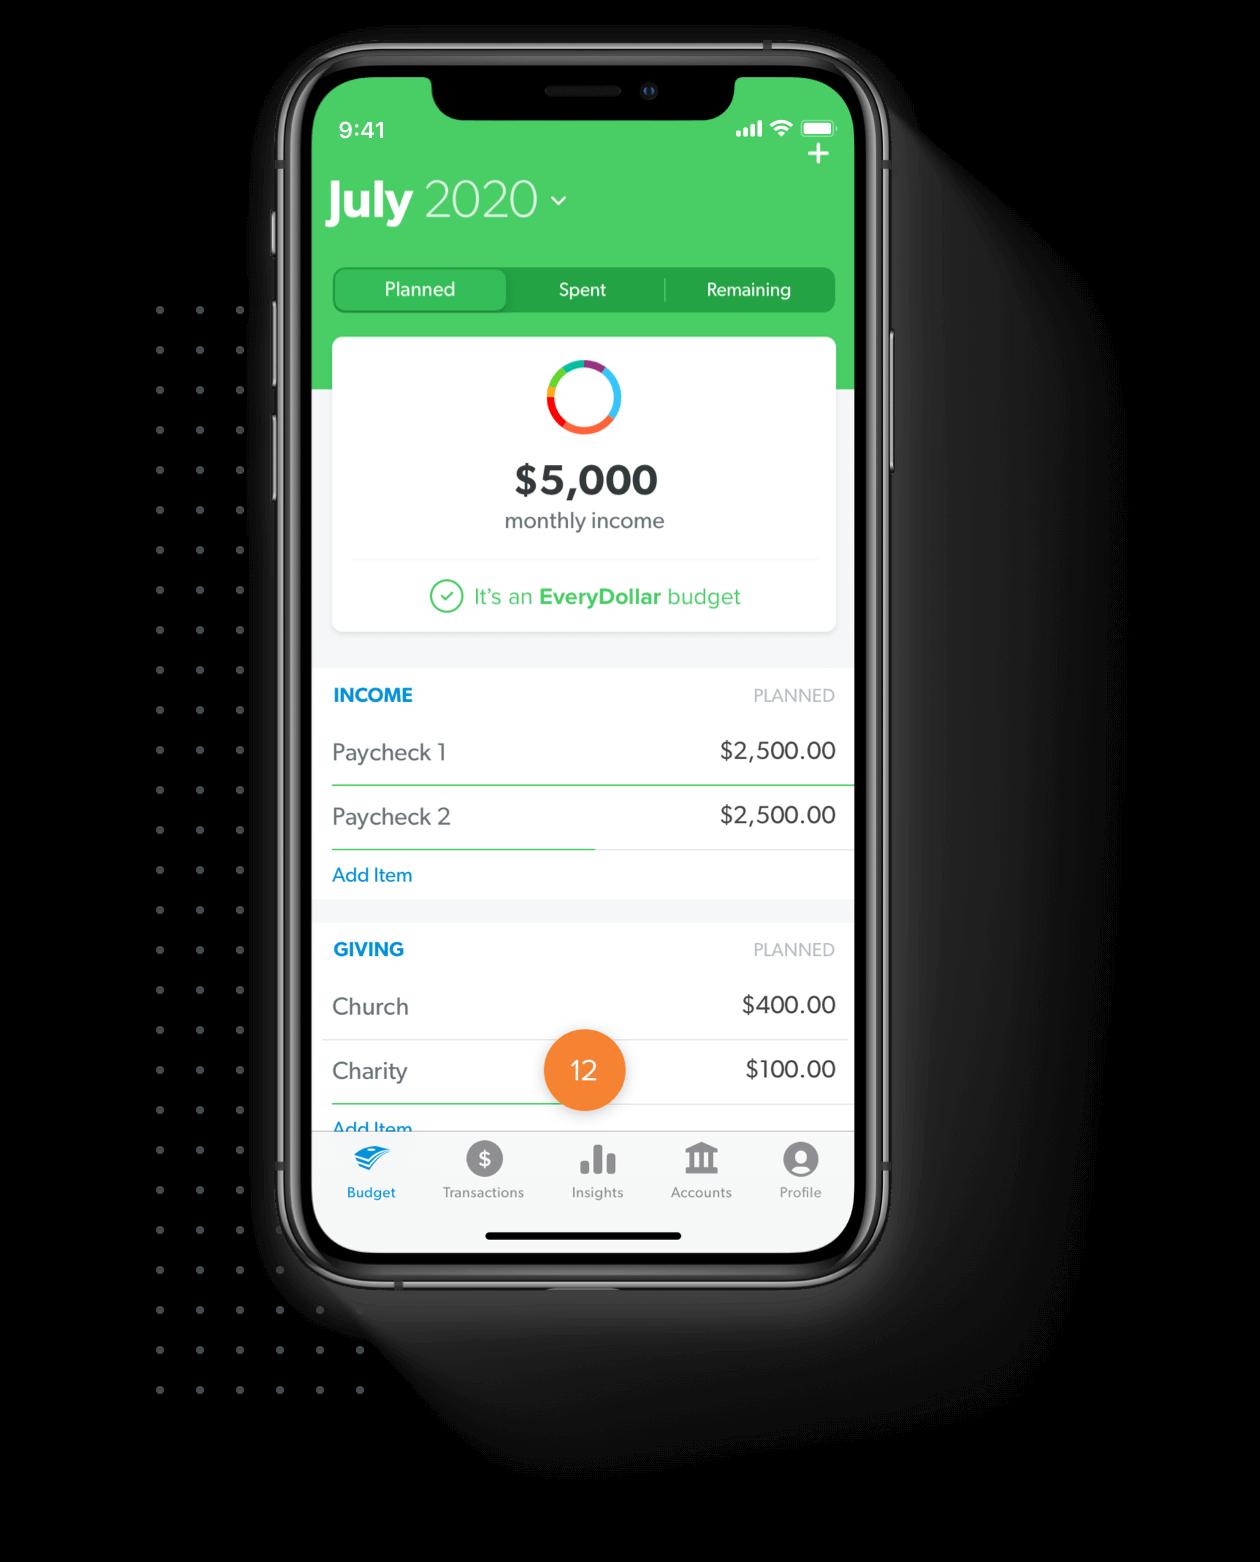 EveryDollar budget shown on mobile app